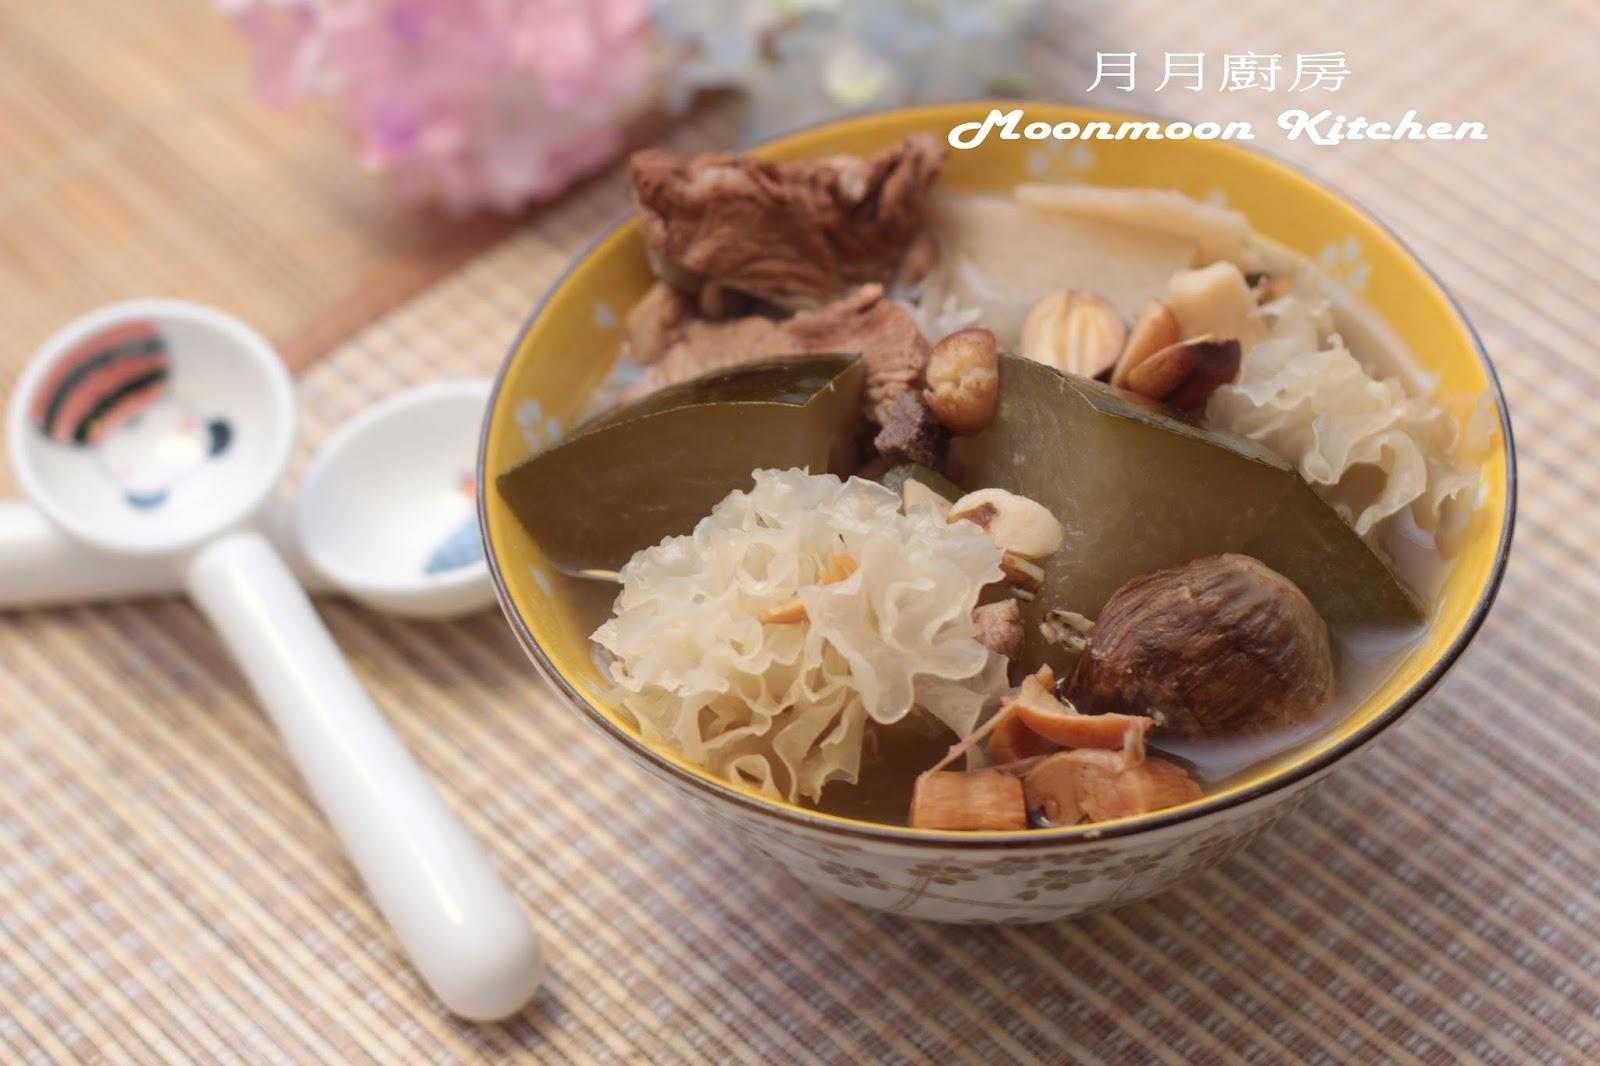 Sandy Mama @ MOONmoon's Kitchen : 食譜~【雪耳冬瓜螺頭唐排湯】